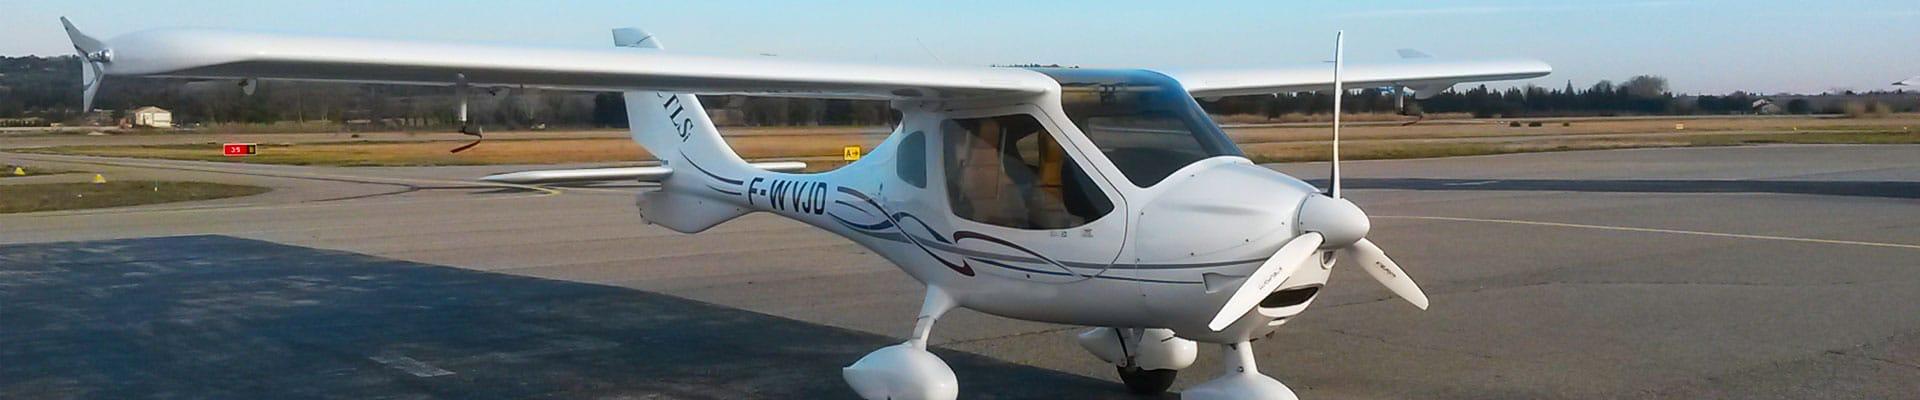 slider-aeroclub-vauclusien-partenaire-sud-vtc-chauffeur-prive